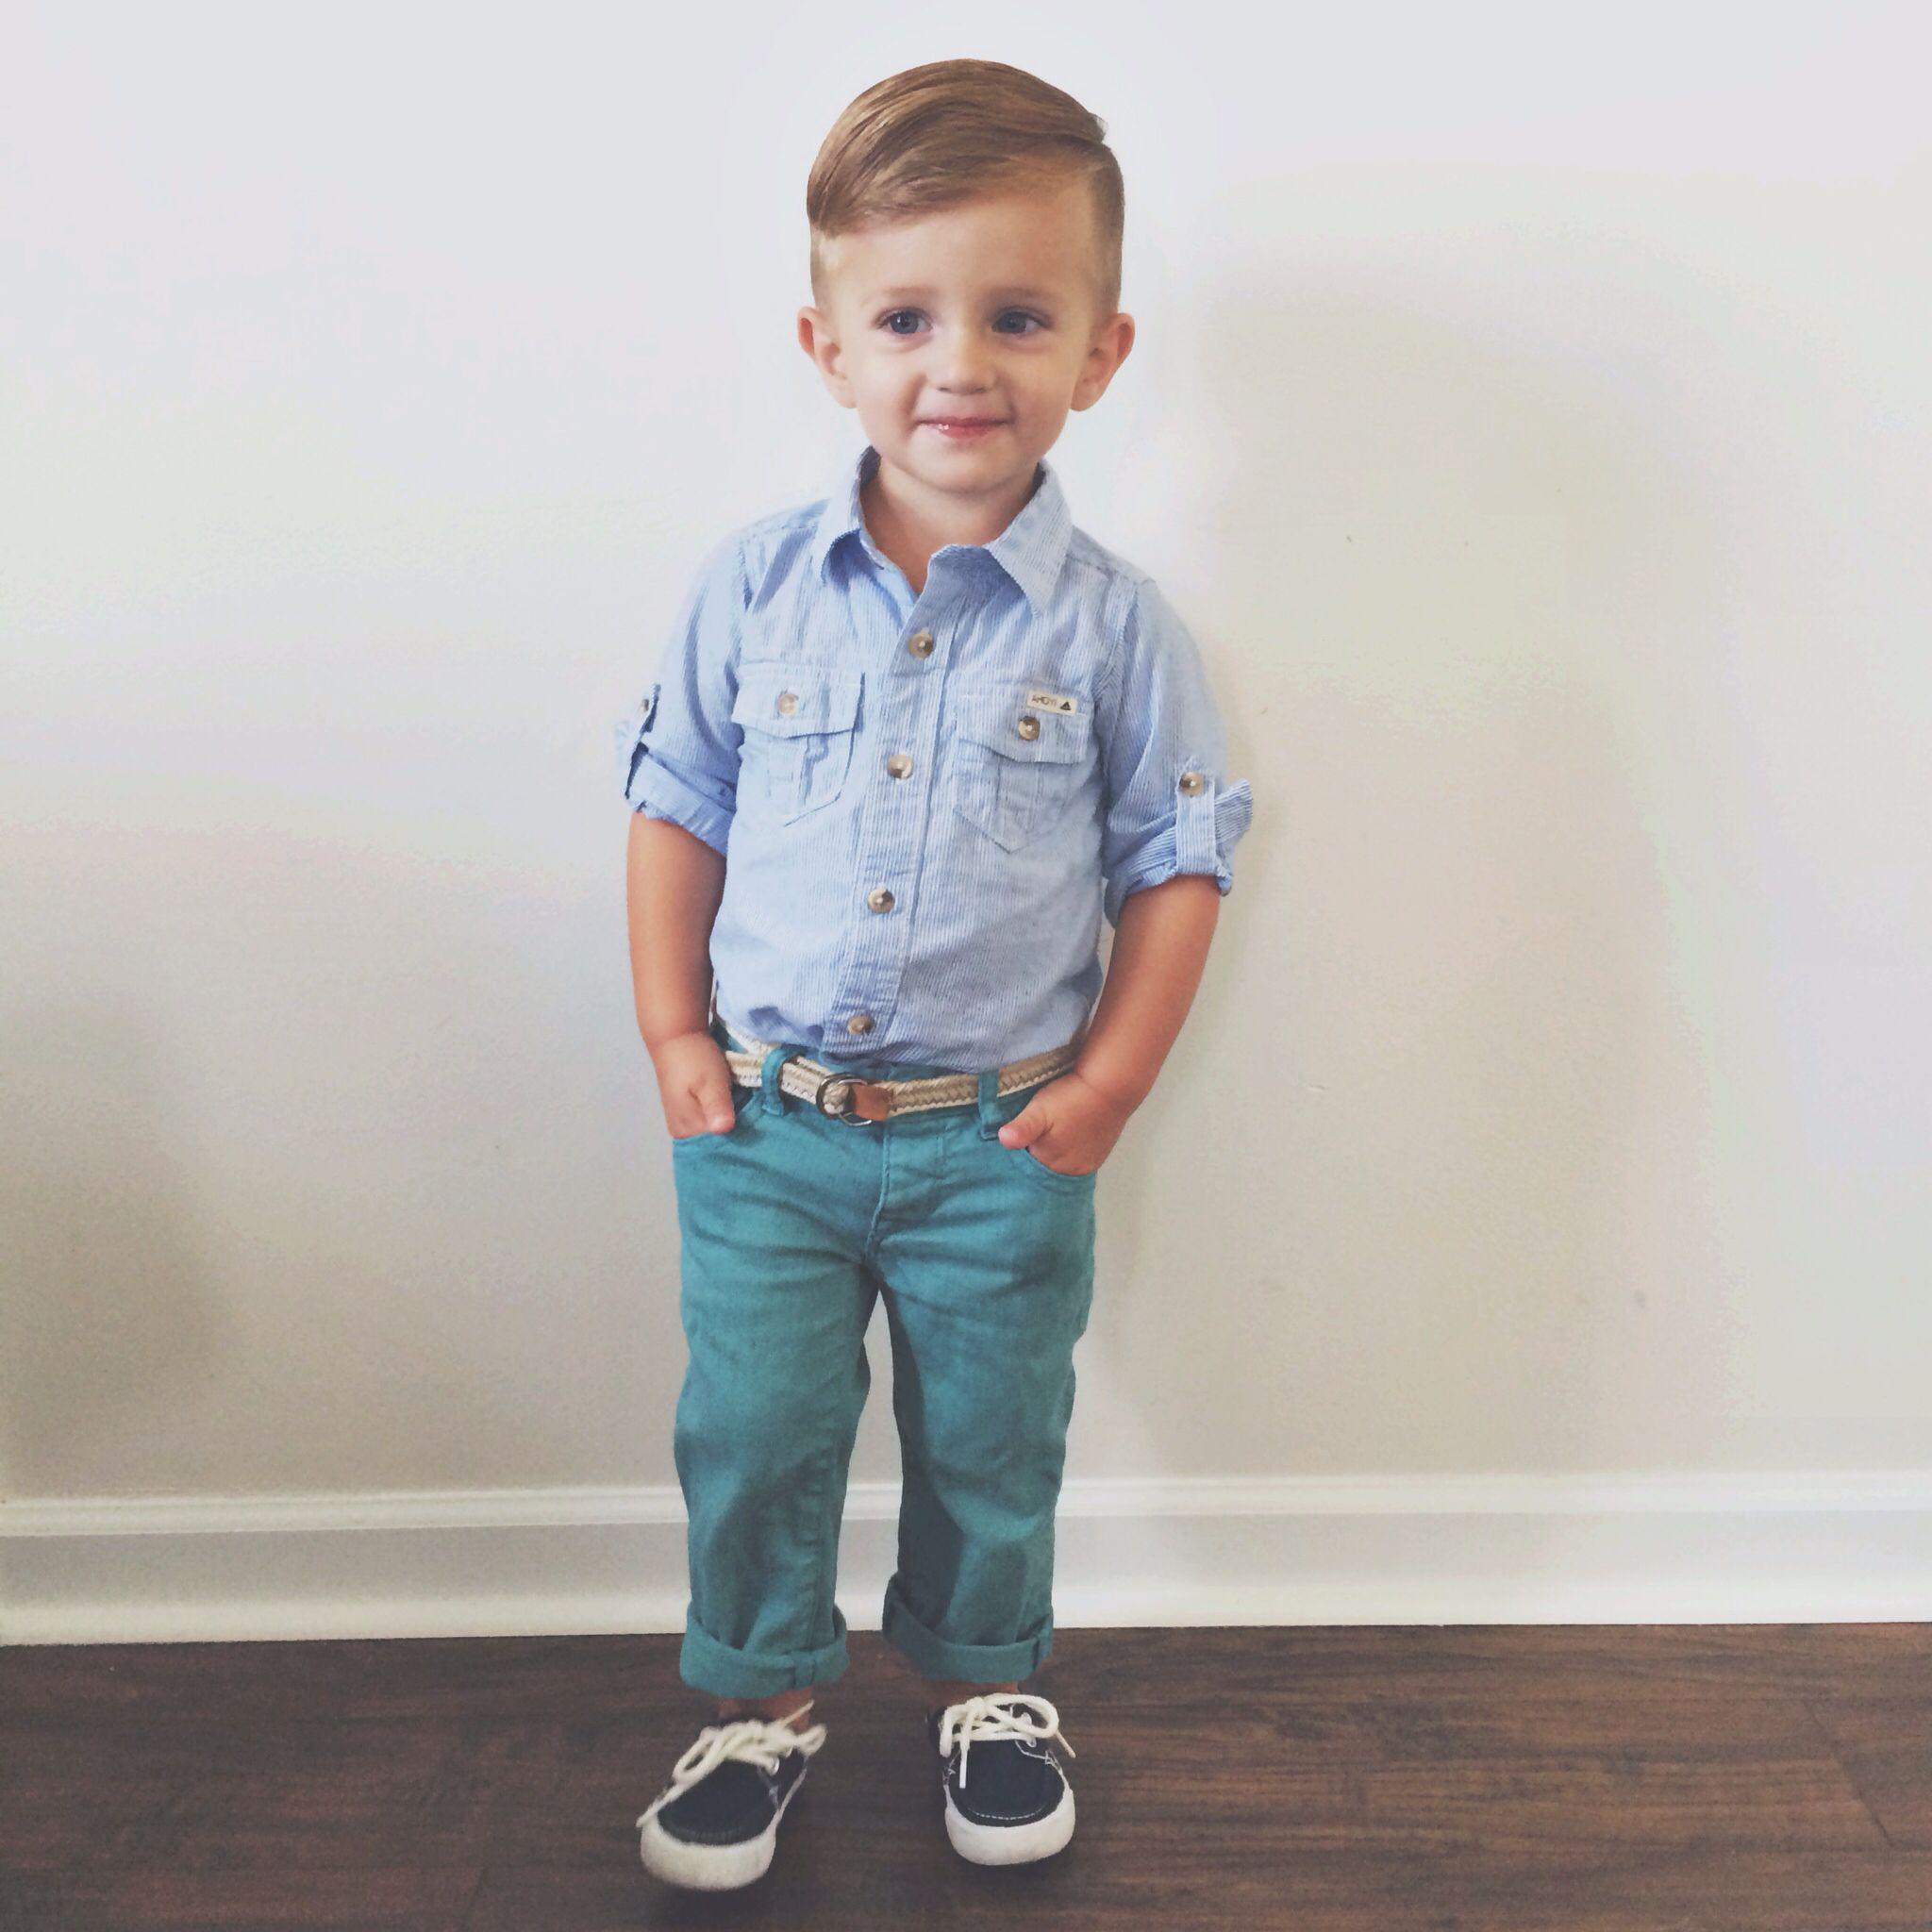 Baby boy fashion via sarahknuth on Instagram Grant